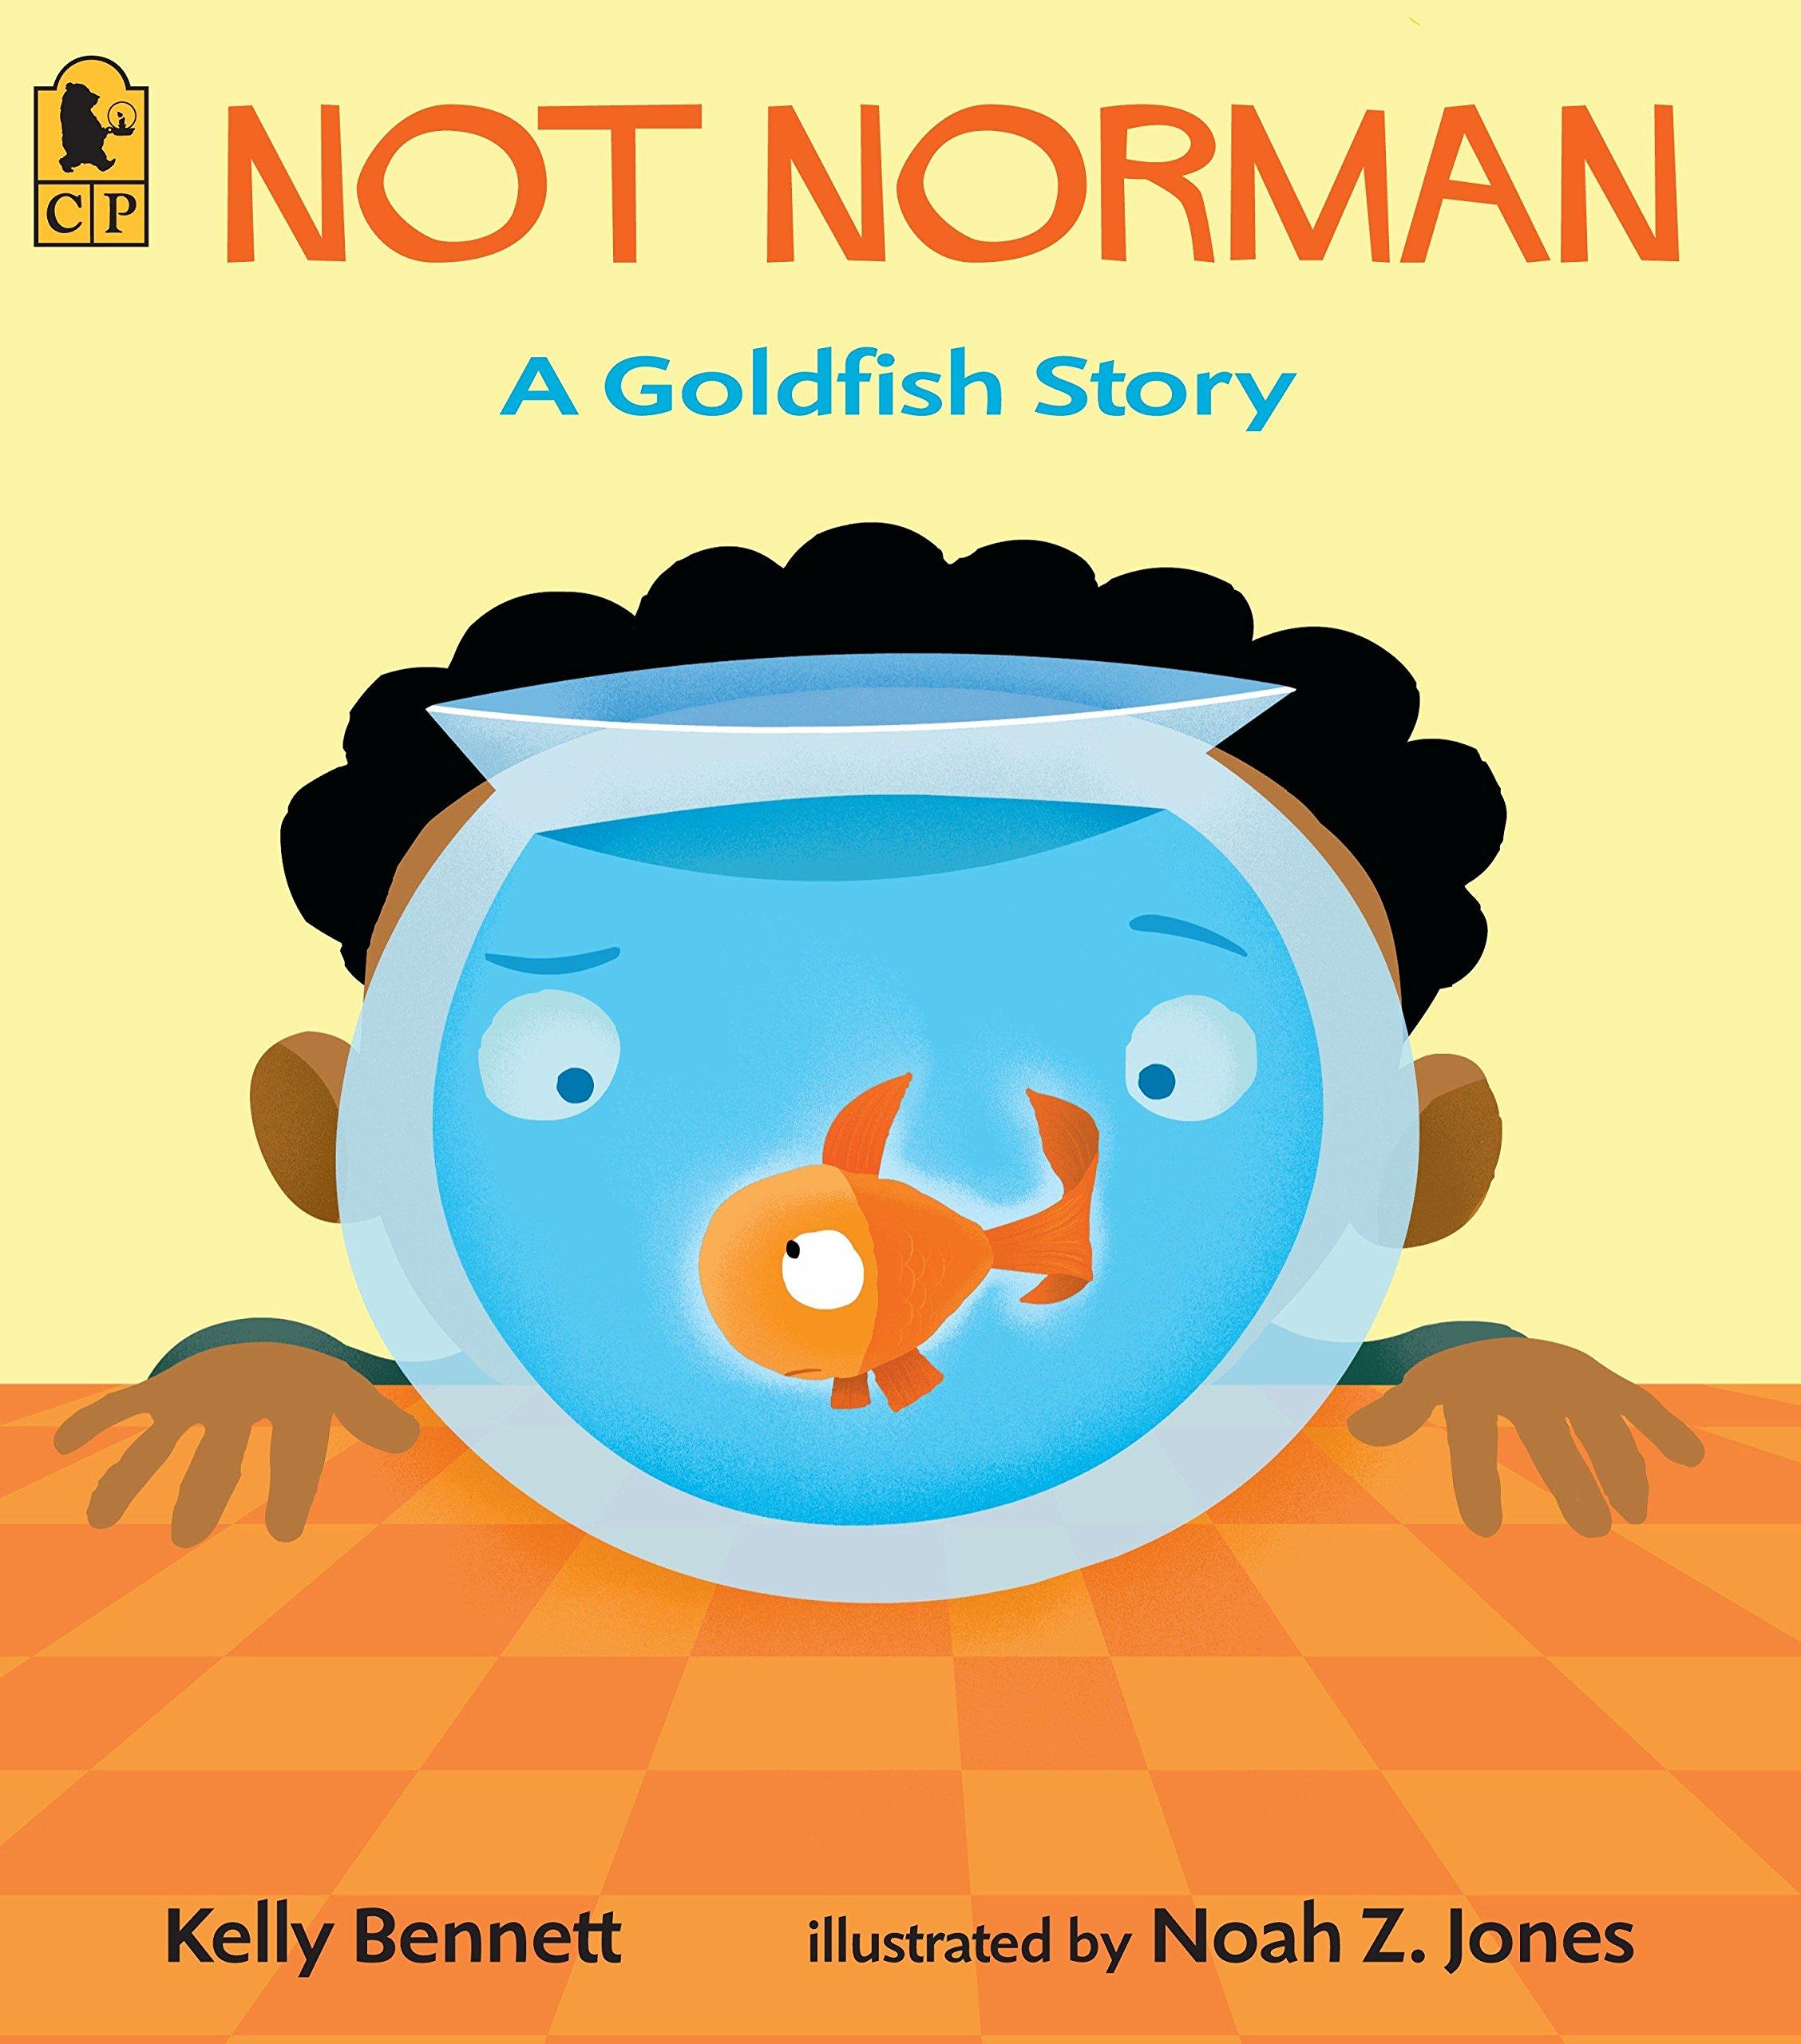 Not Norman: A Goldfish Story: Bennett, Kelly, Jones, Noah Z.: 9780763627638: Amazon.com: Books